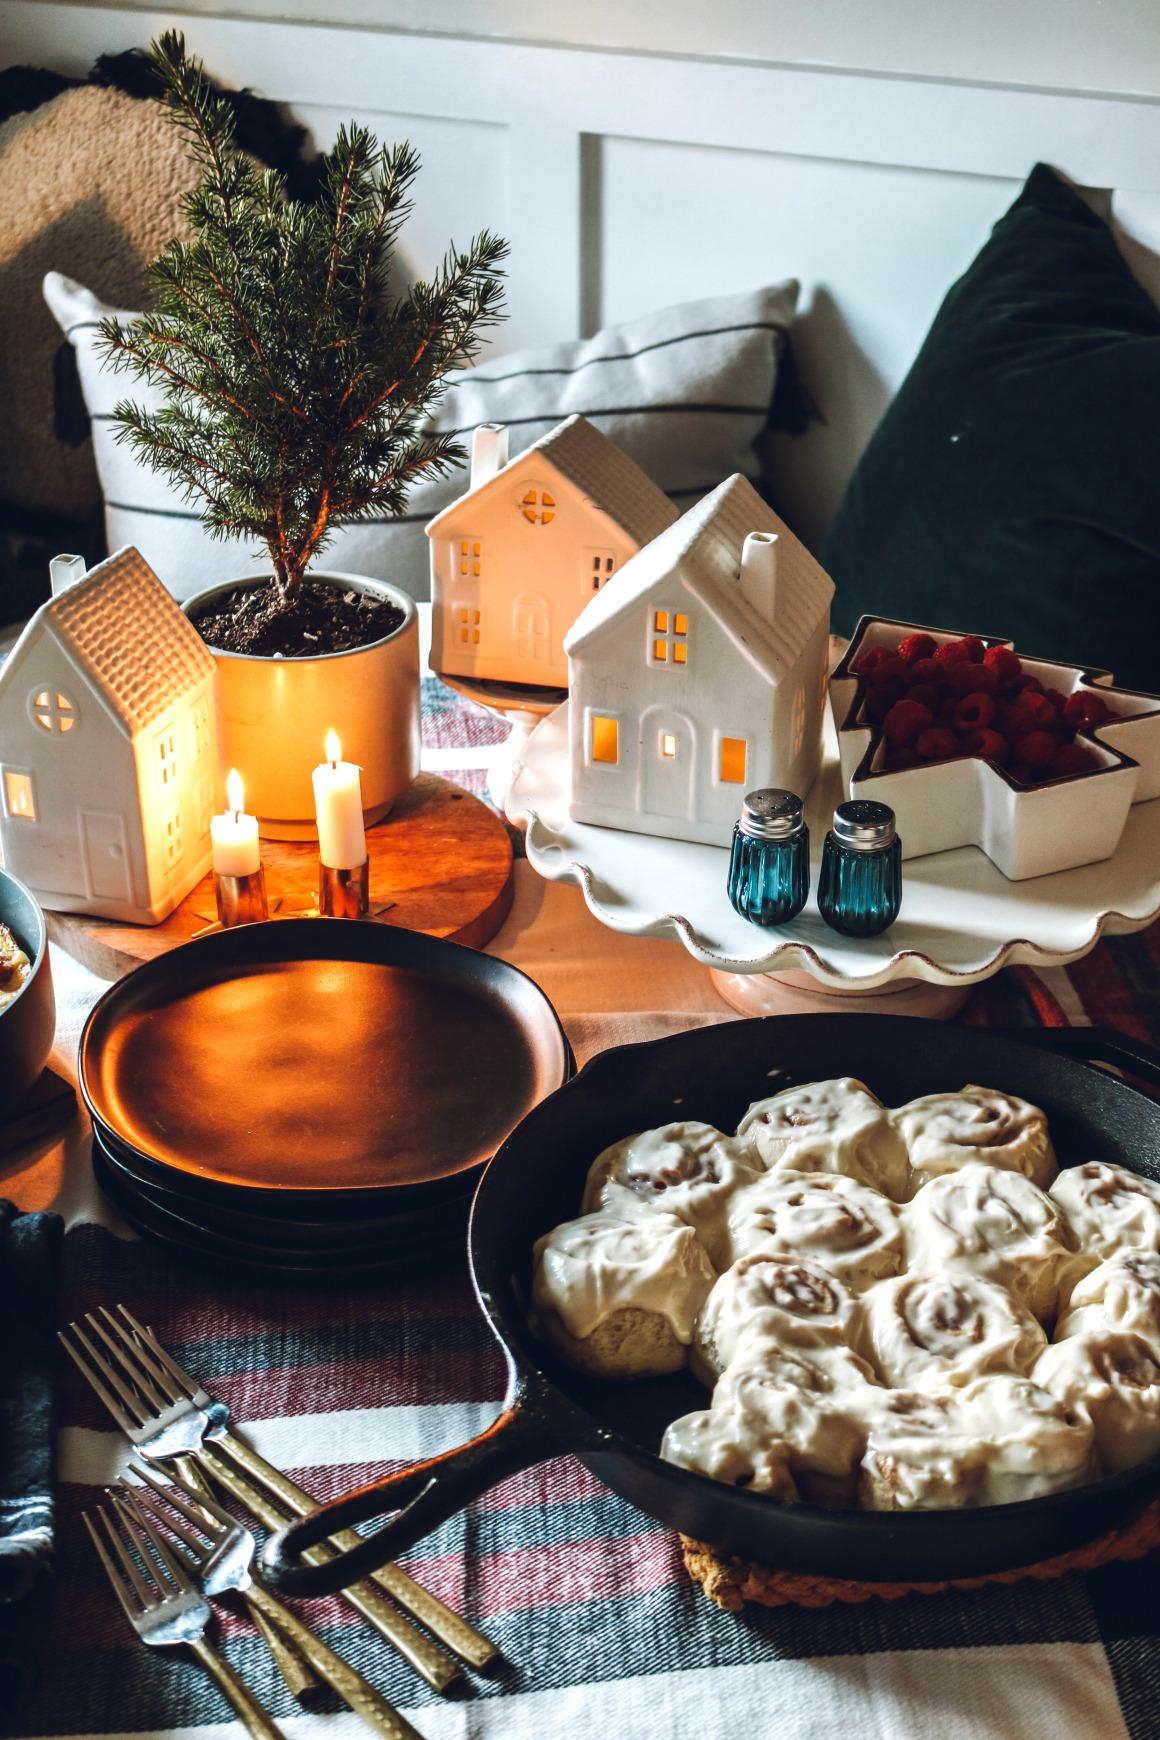 The Christmas Breakfast Everyone Wants!